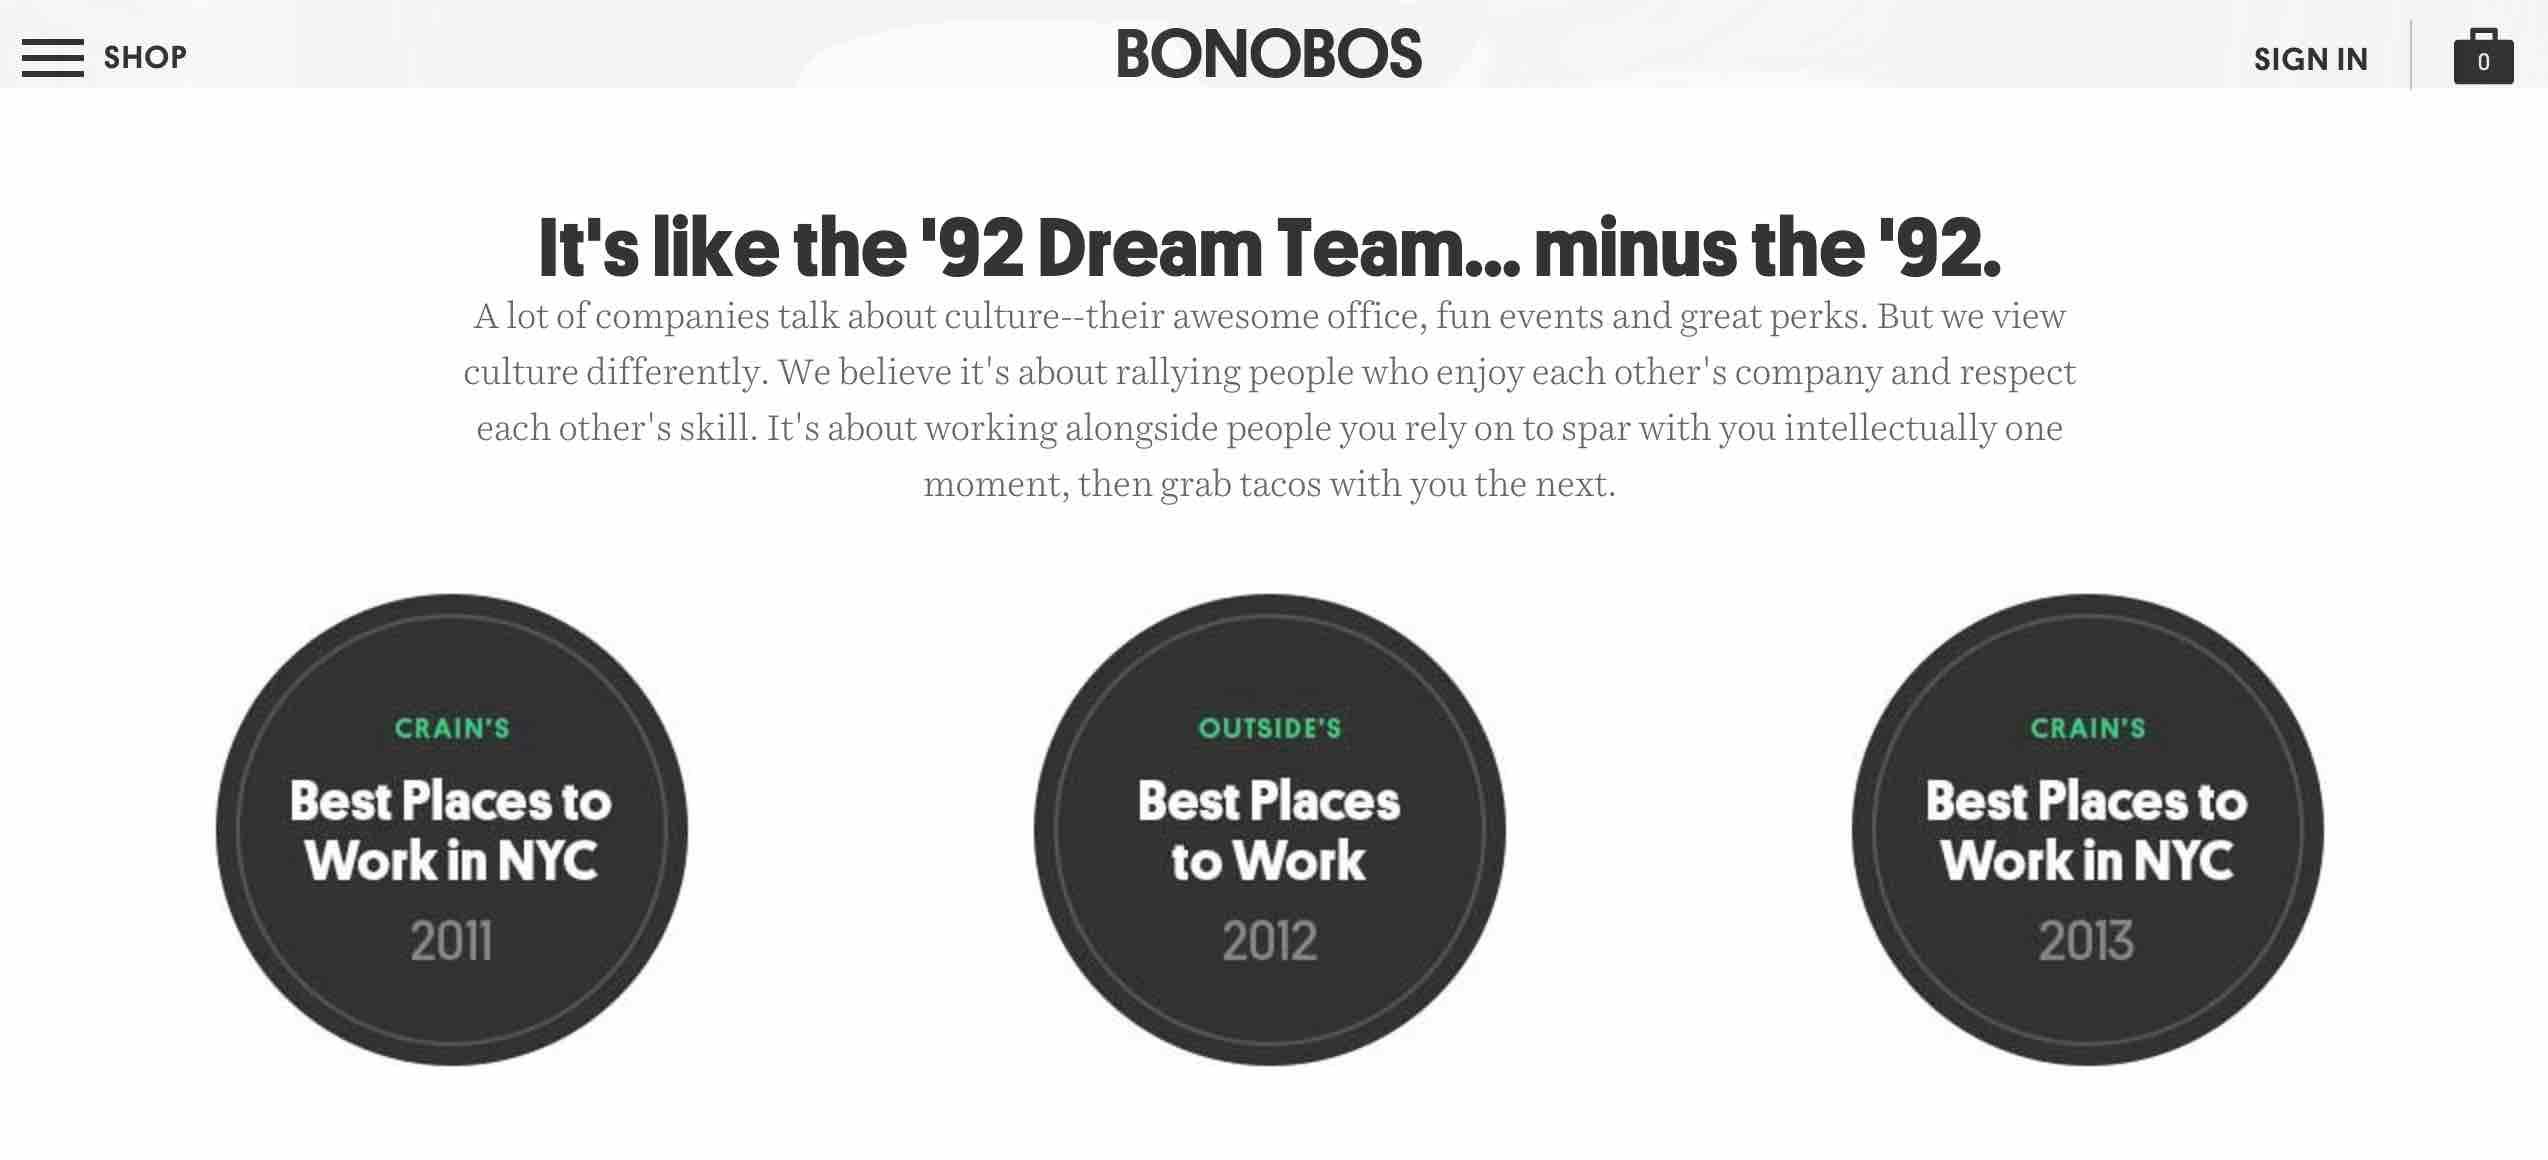 Bonobos Careers Page